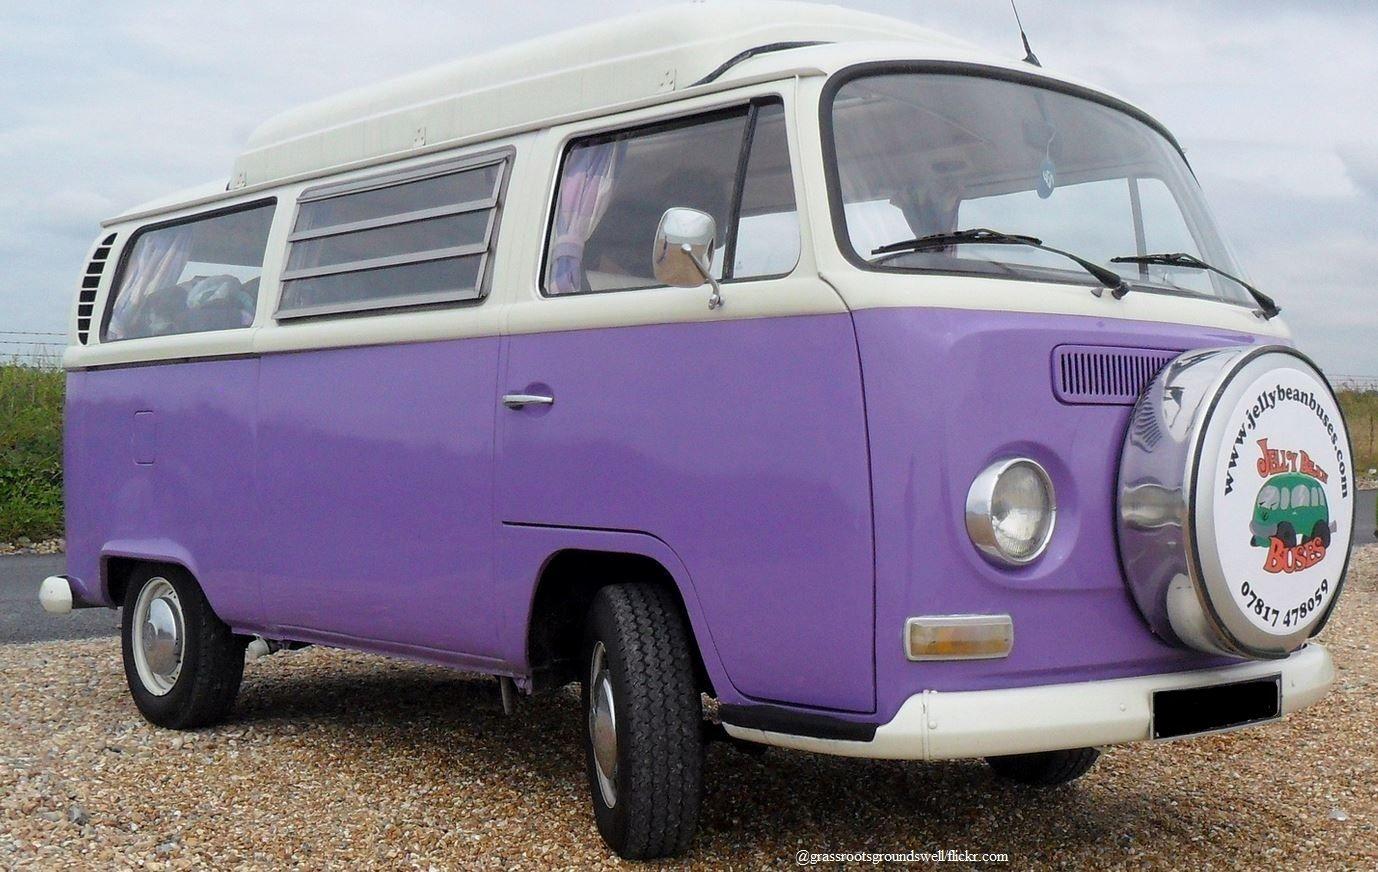 Beat The Heat Pack The Campingvan And Spend The Weekend In Nature Campingbus Campingvan Vwbus Vwvan Purlple Lila Vw Van For Sale Vw Van Van For Sale